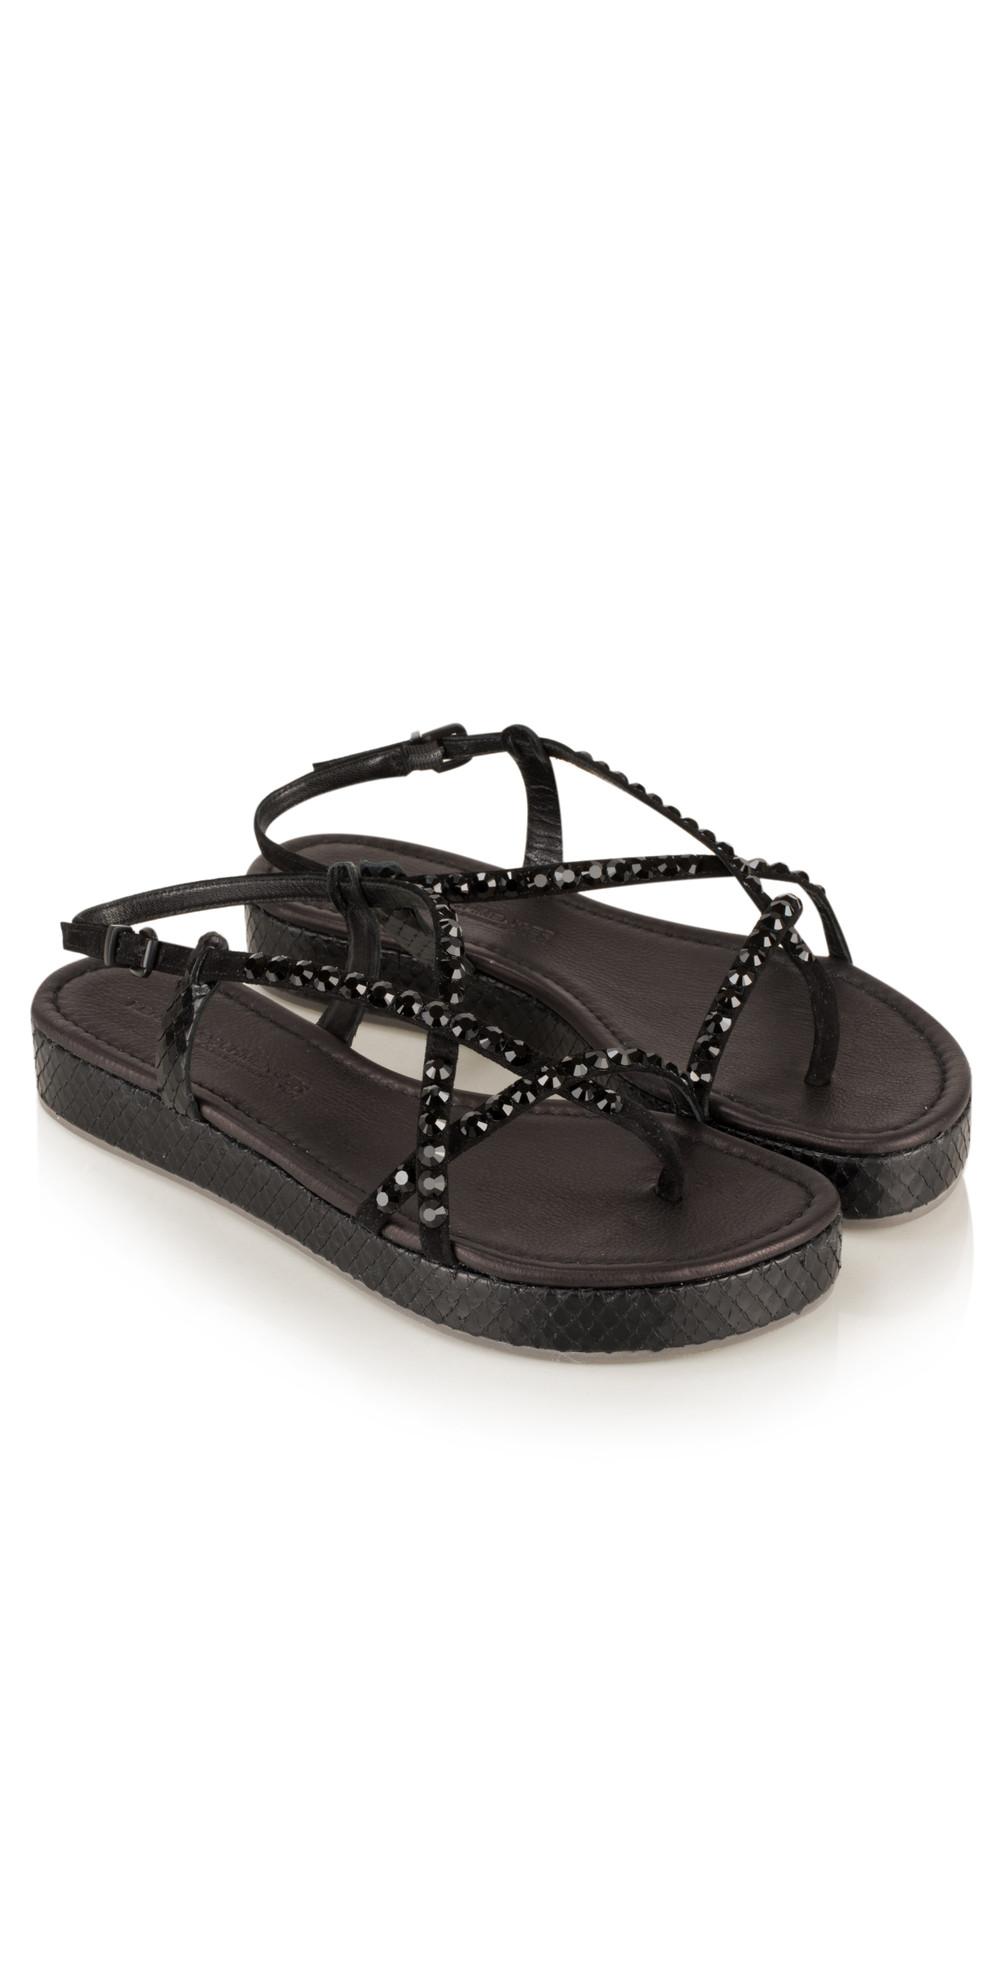 kennel und schmenger neo viper crystal sandal in schwarz. Black Bedroom Furniture Sets. Home Design Ideas